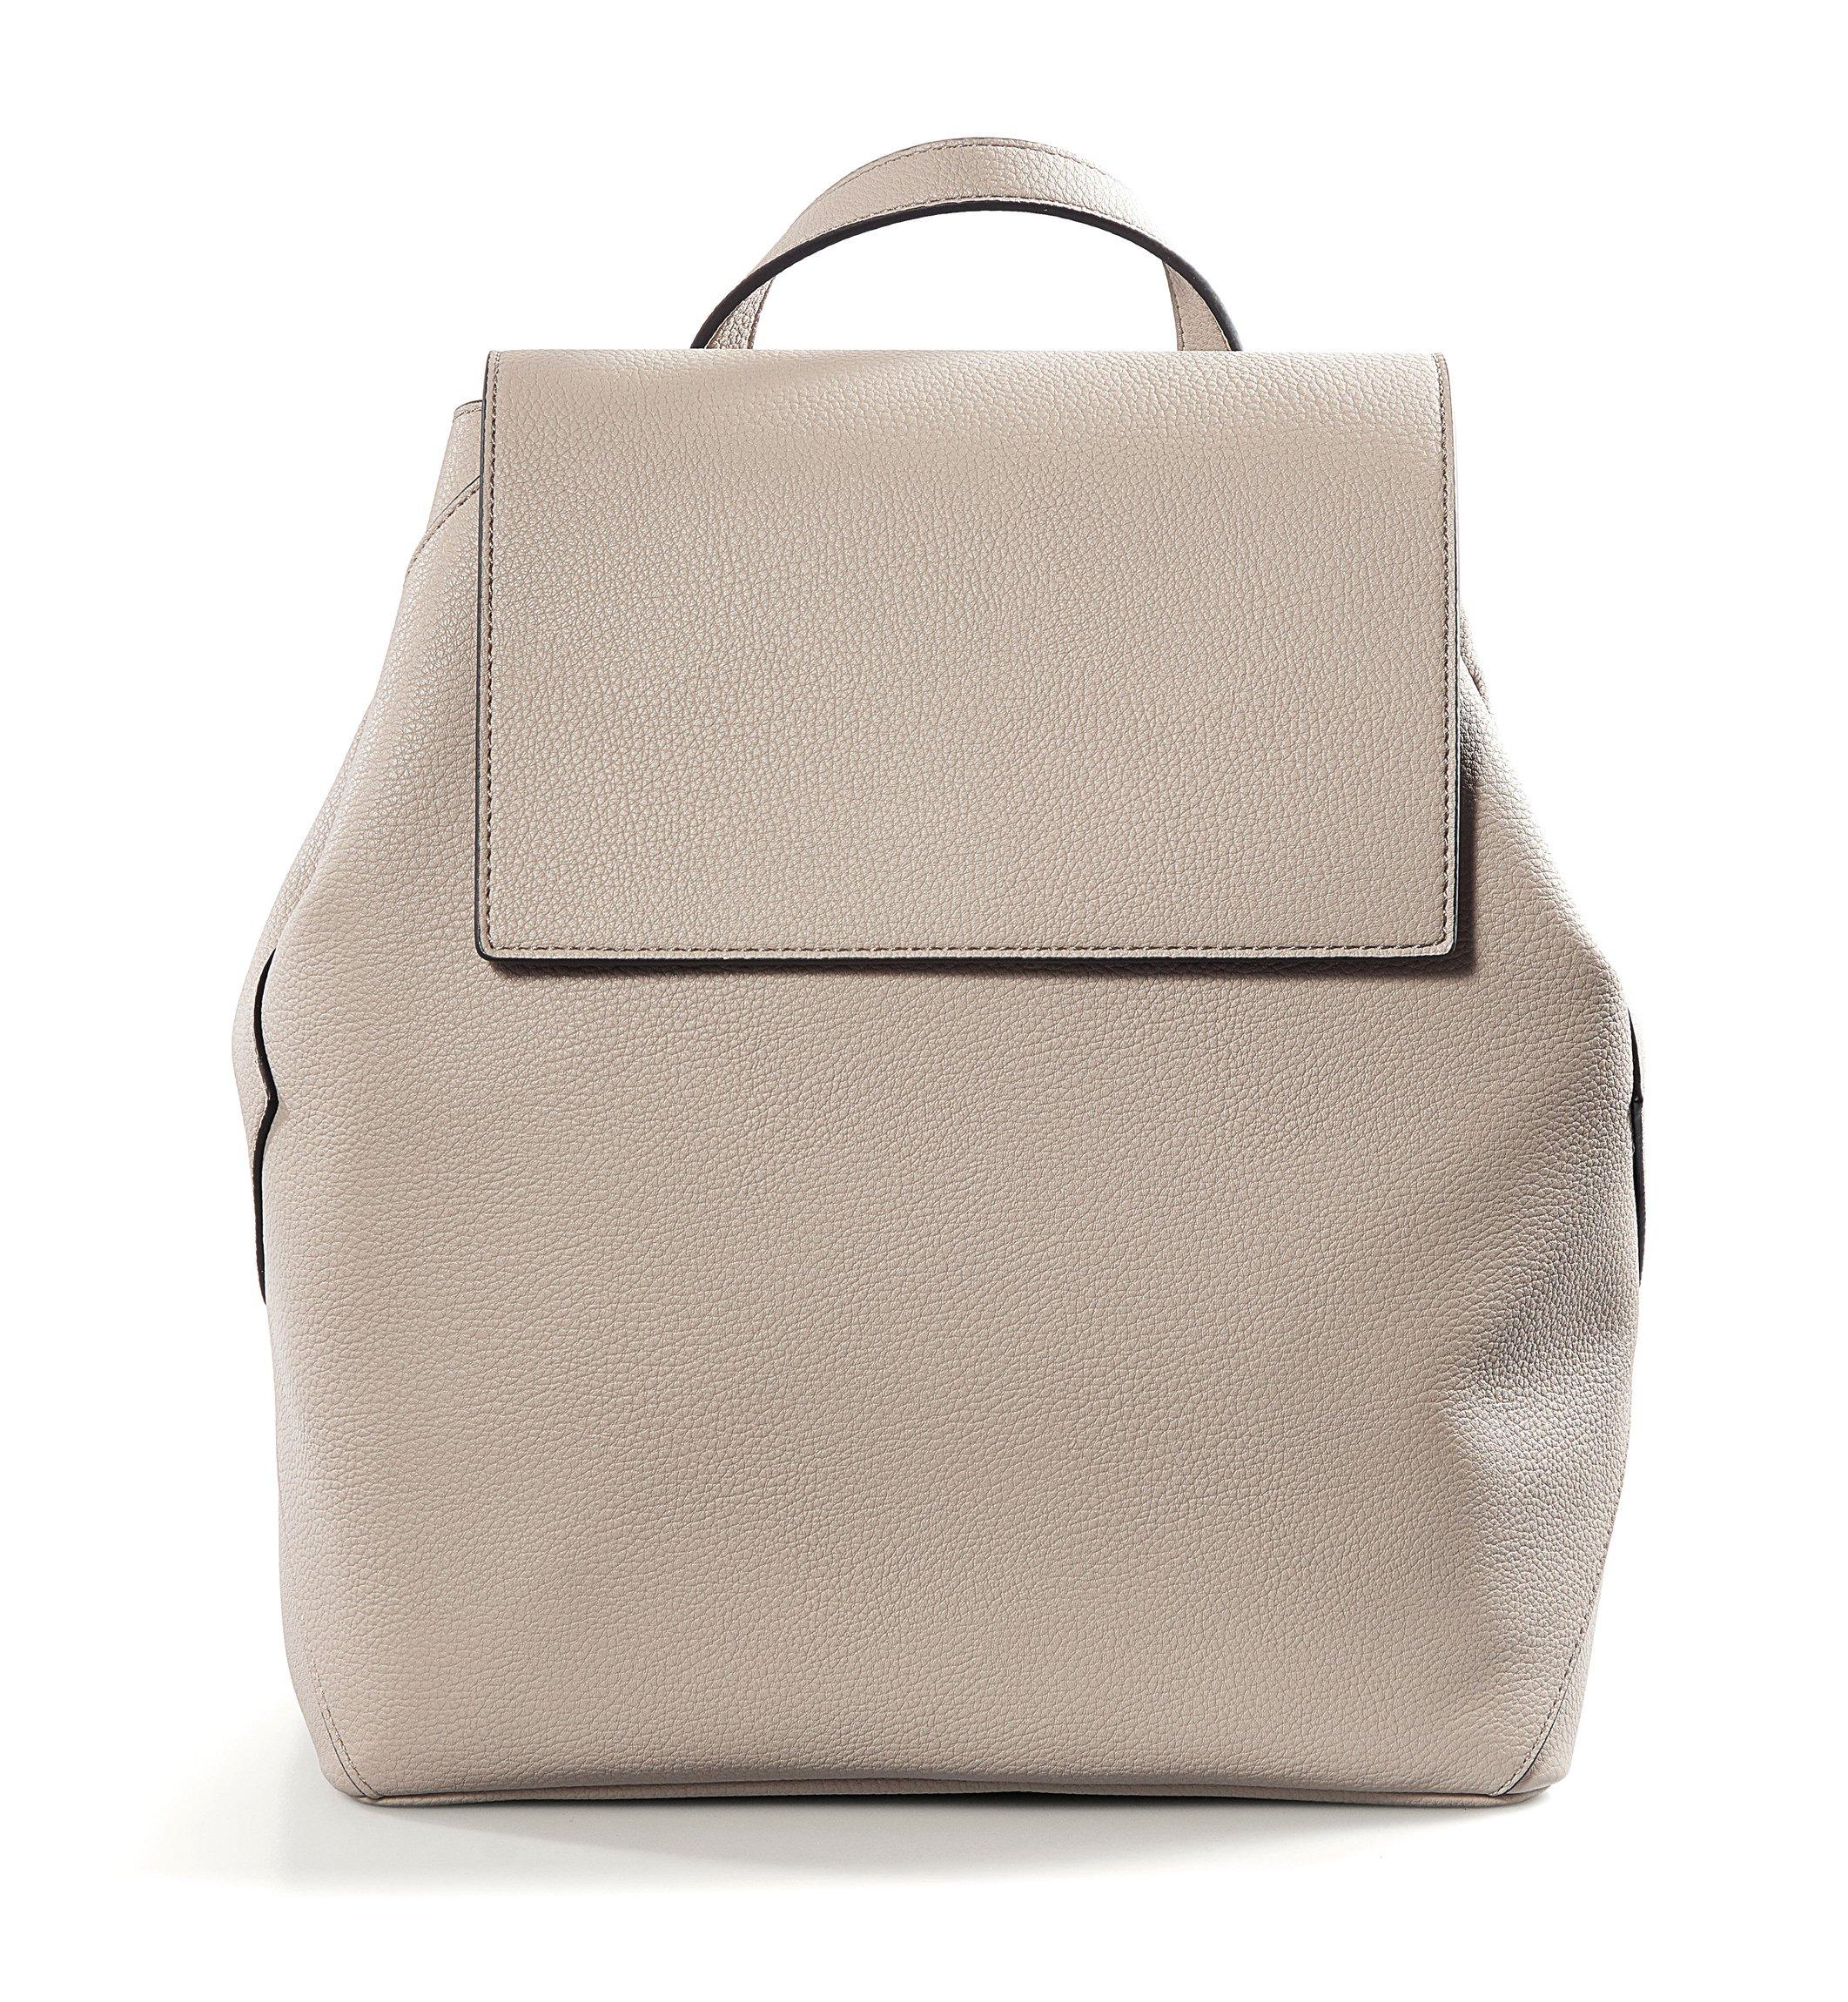 French Connection Backpack Bag Nina Backpack Fcuk504 Mink